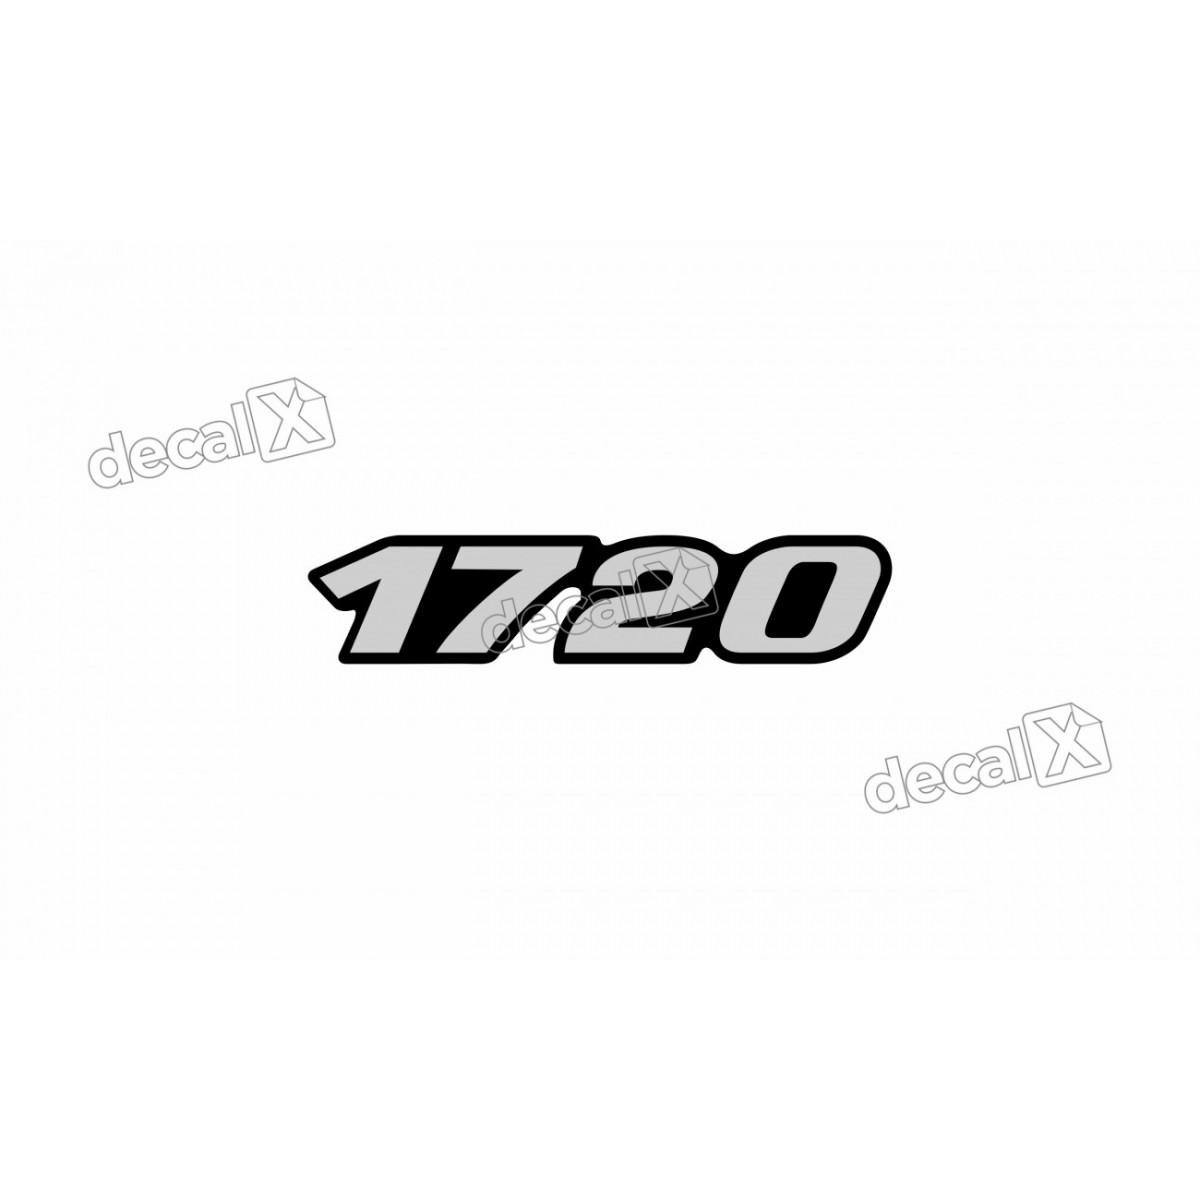 Adesivo Emblema Resinado Mercedes 1720 Cm60 Decalx